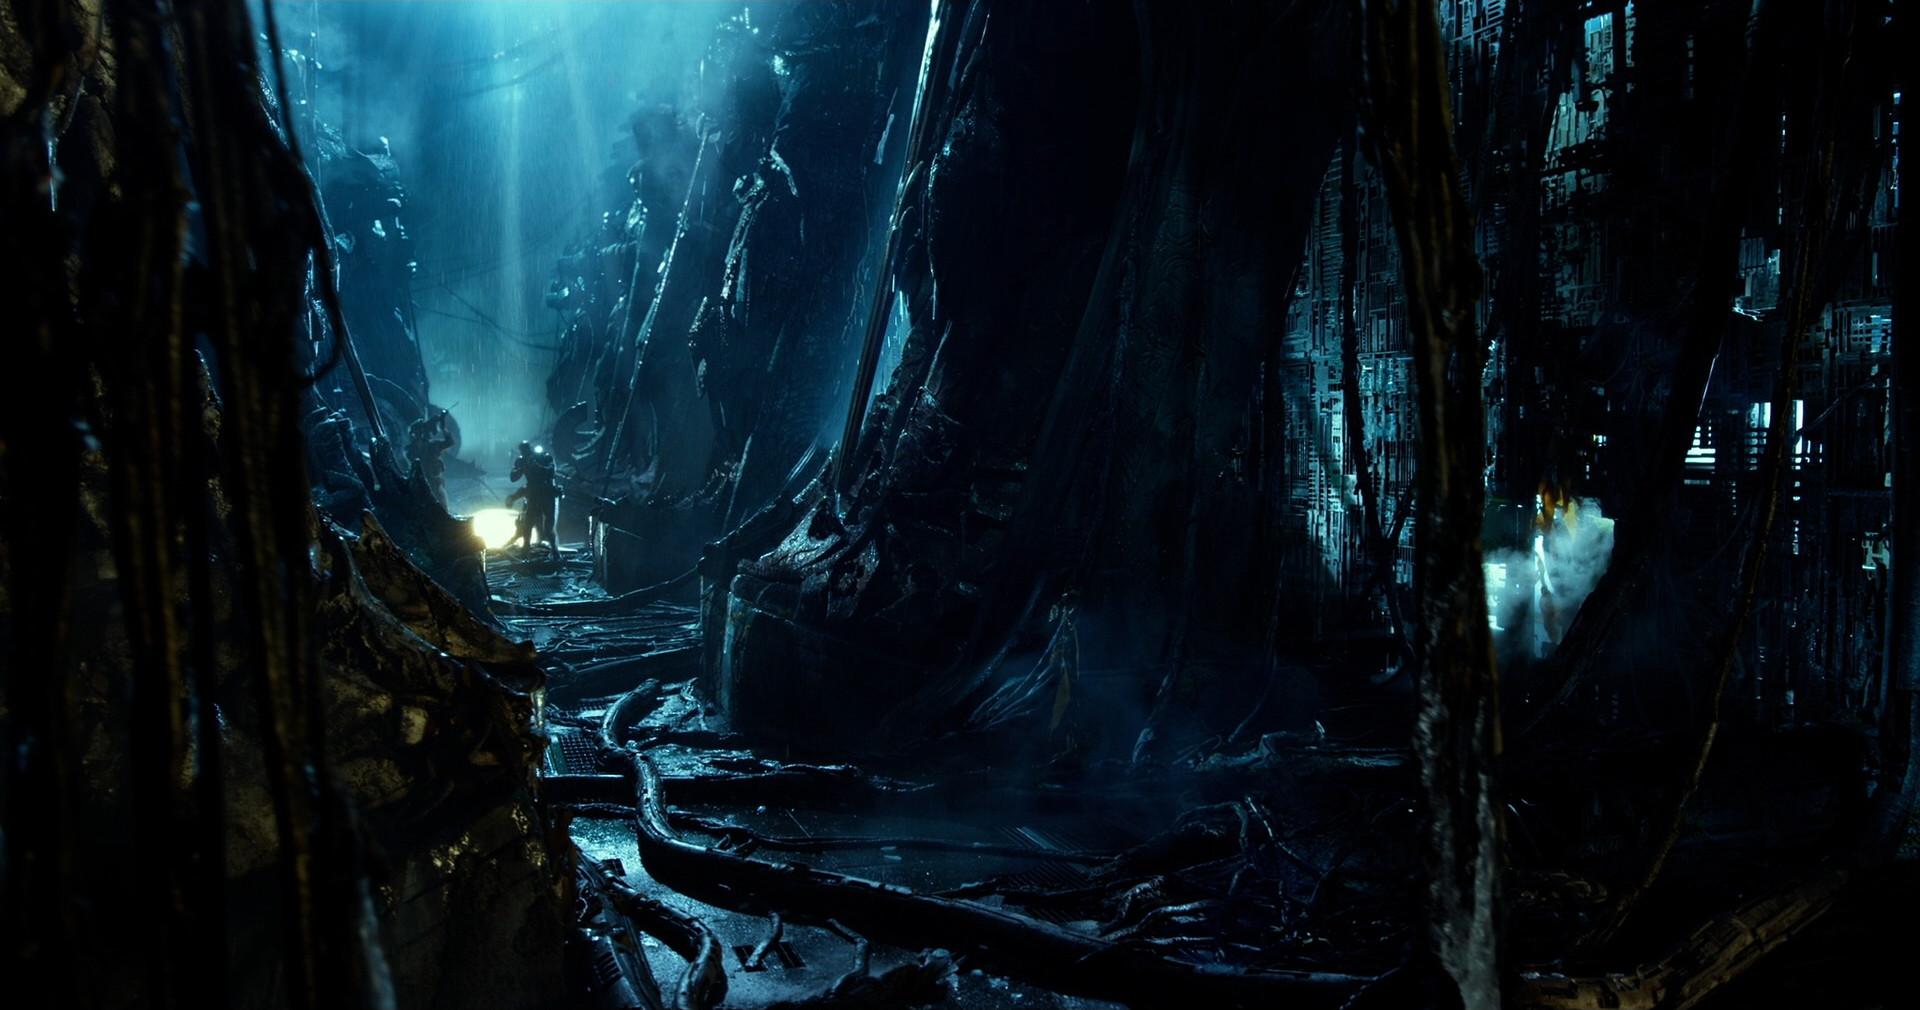 Saby menyhei transformers5 knightscorridor01 jhm v001